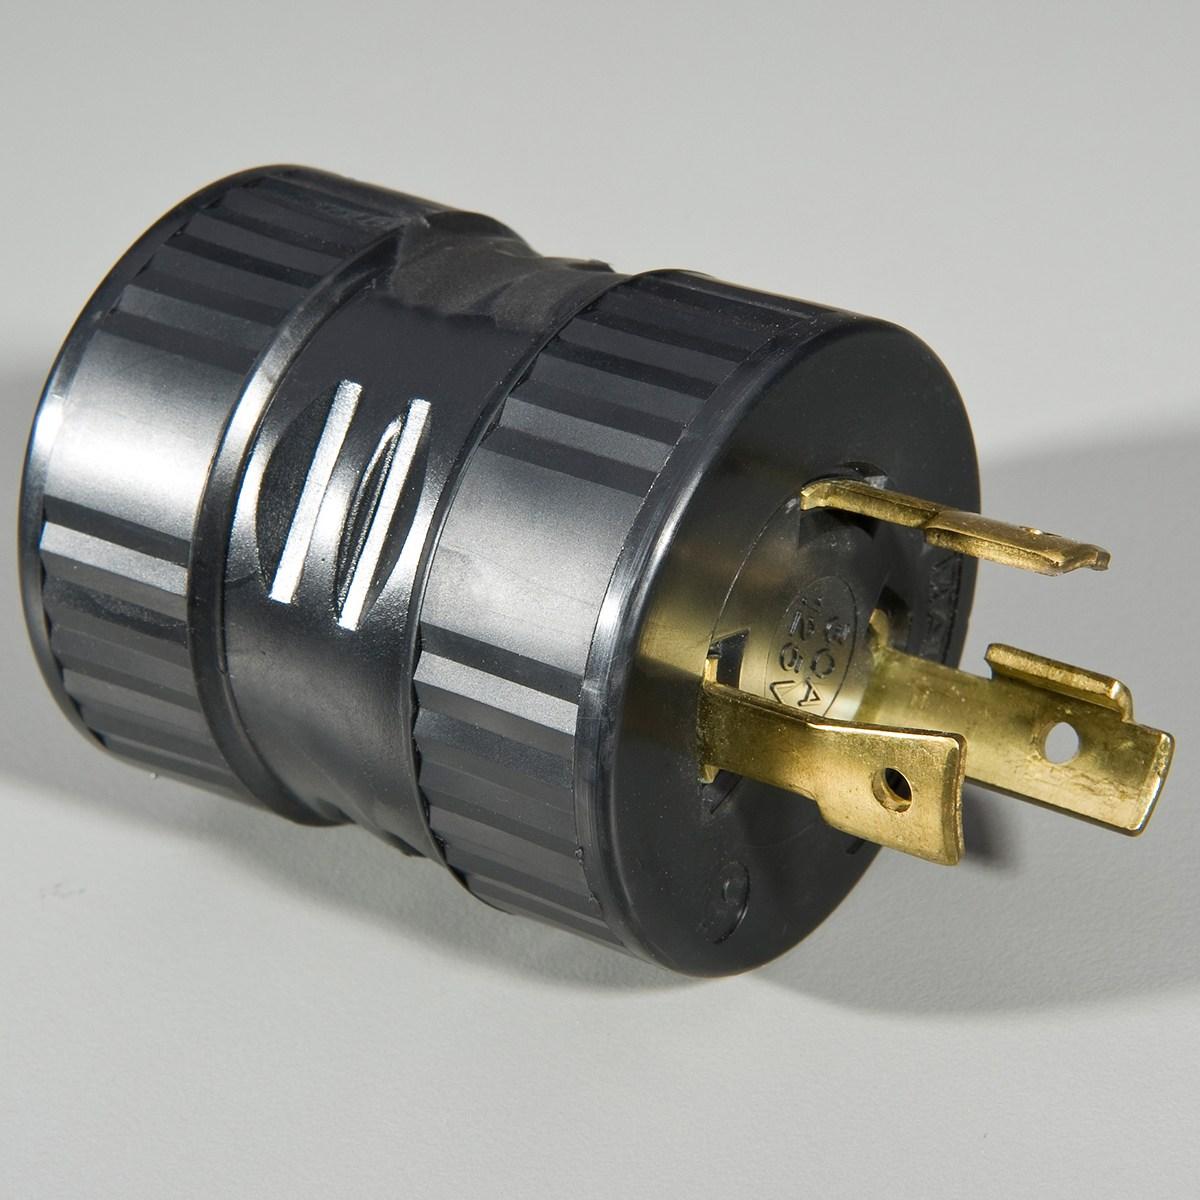 Yamaha Twistlock 30A RV Adapter Plug